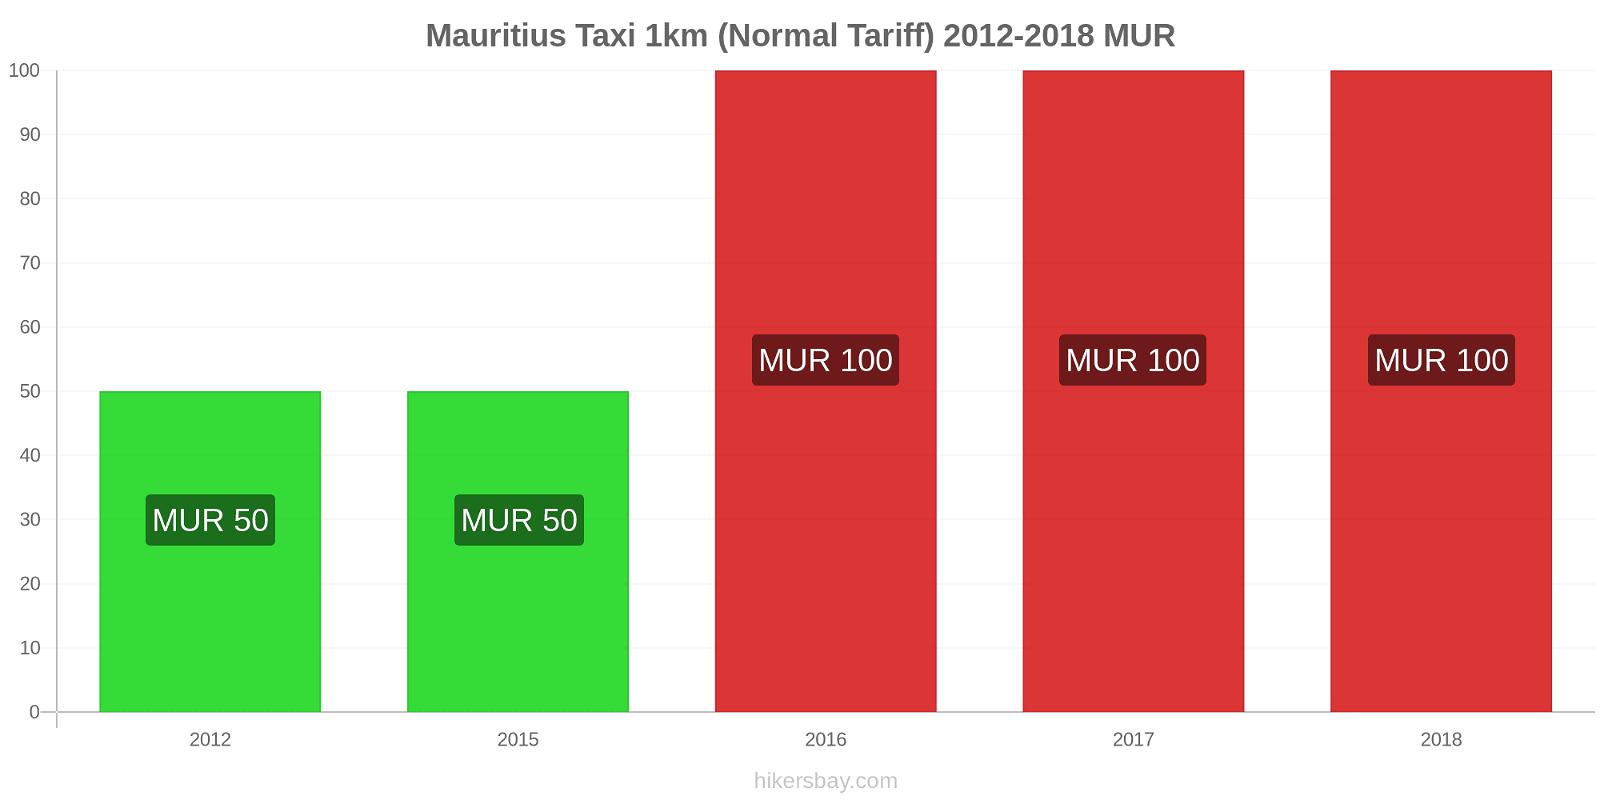 Mauritius price changes Taxi 1km (Normal Tariff) hikersbay.com